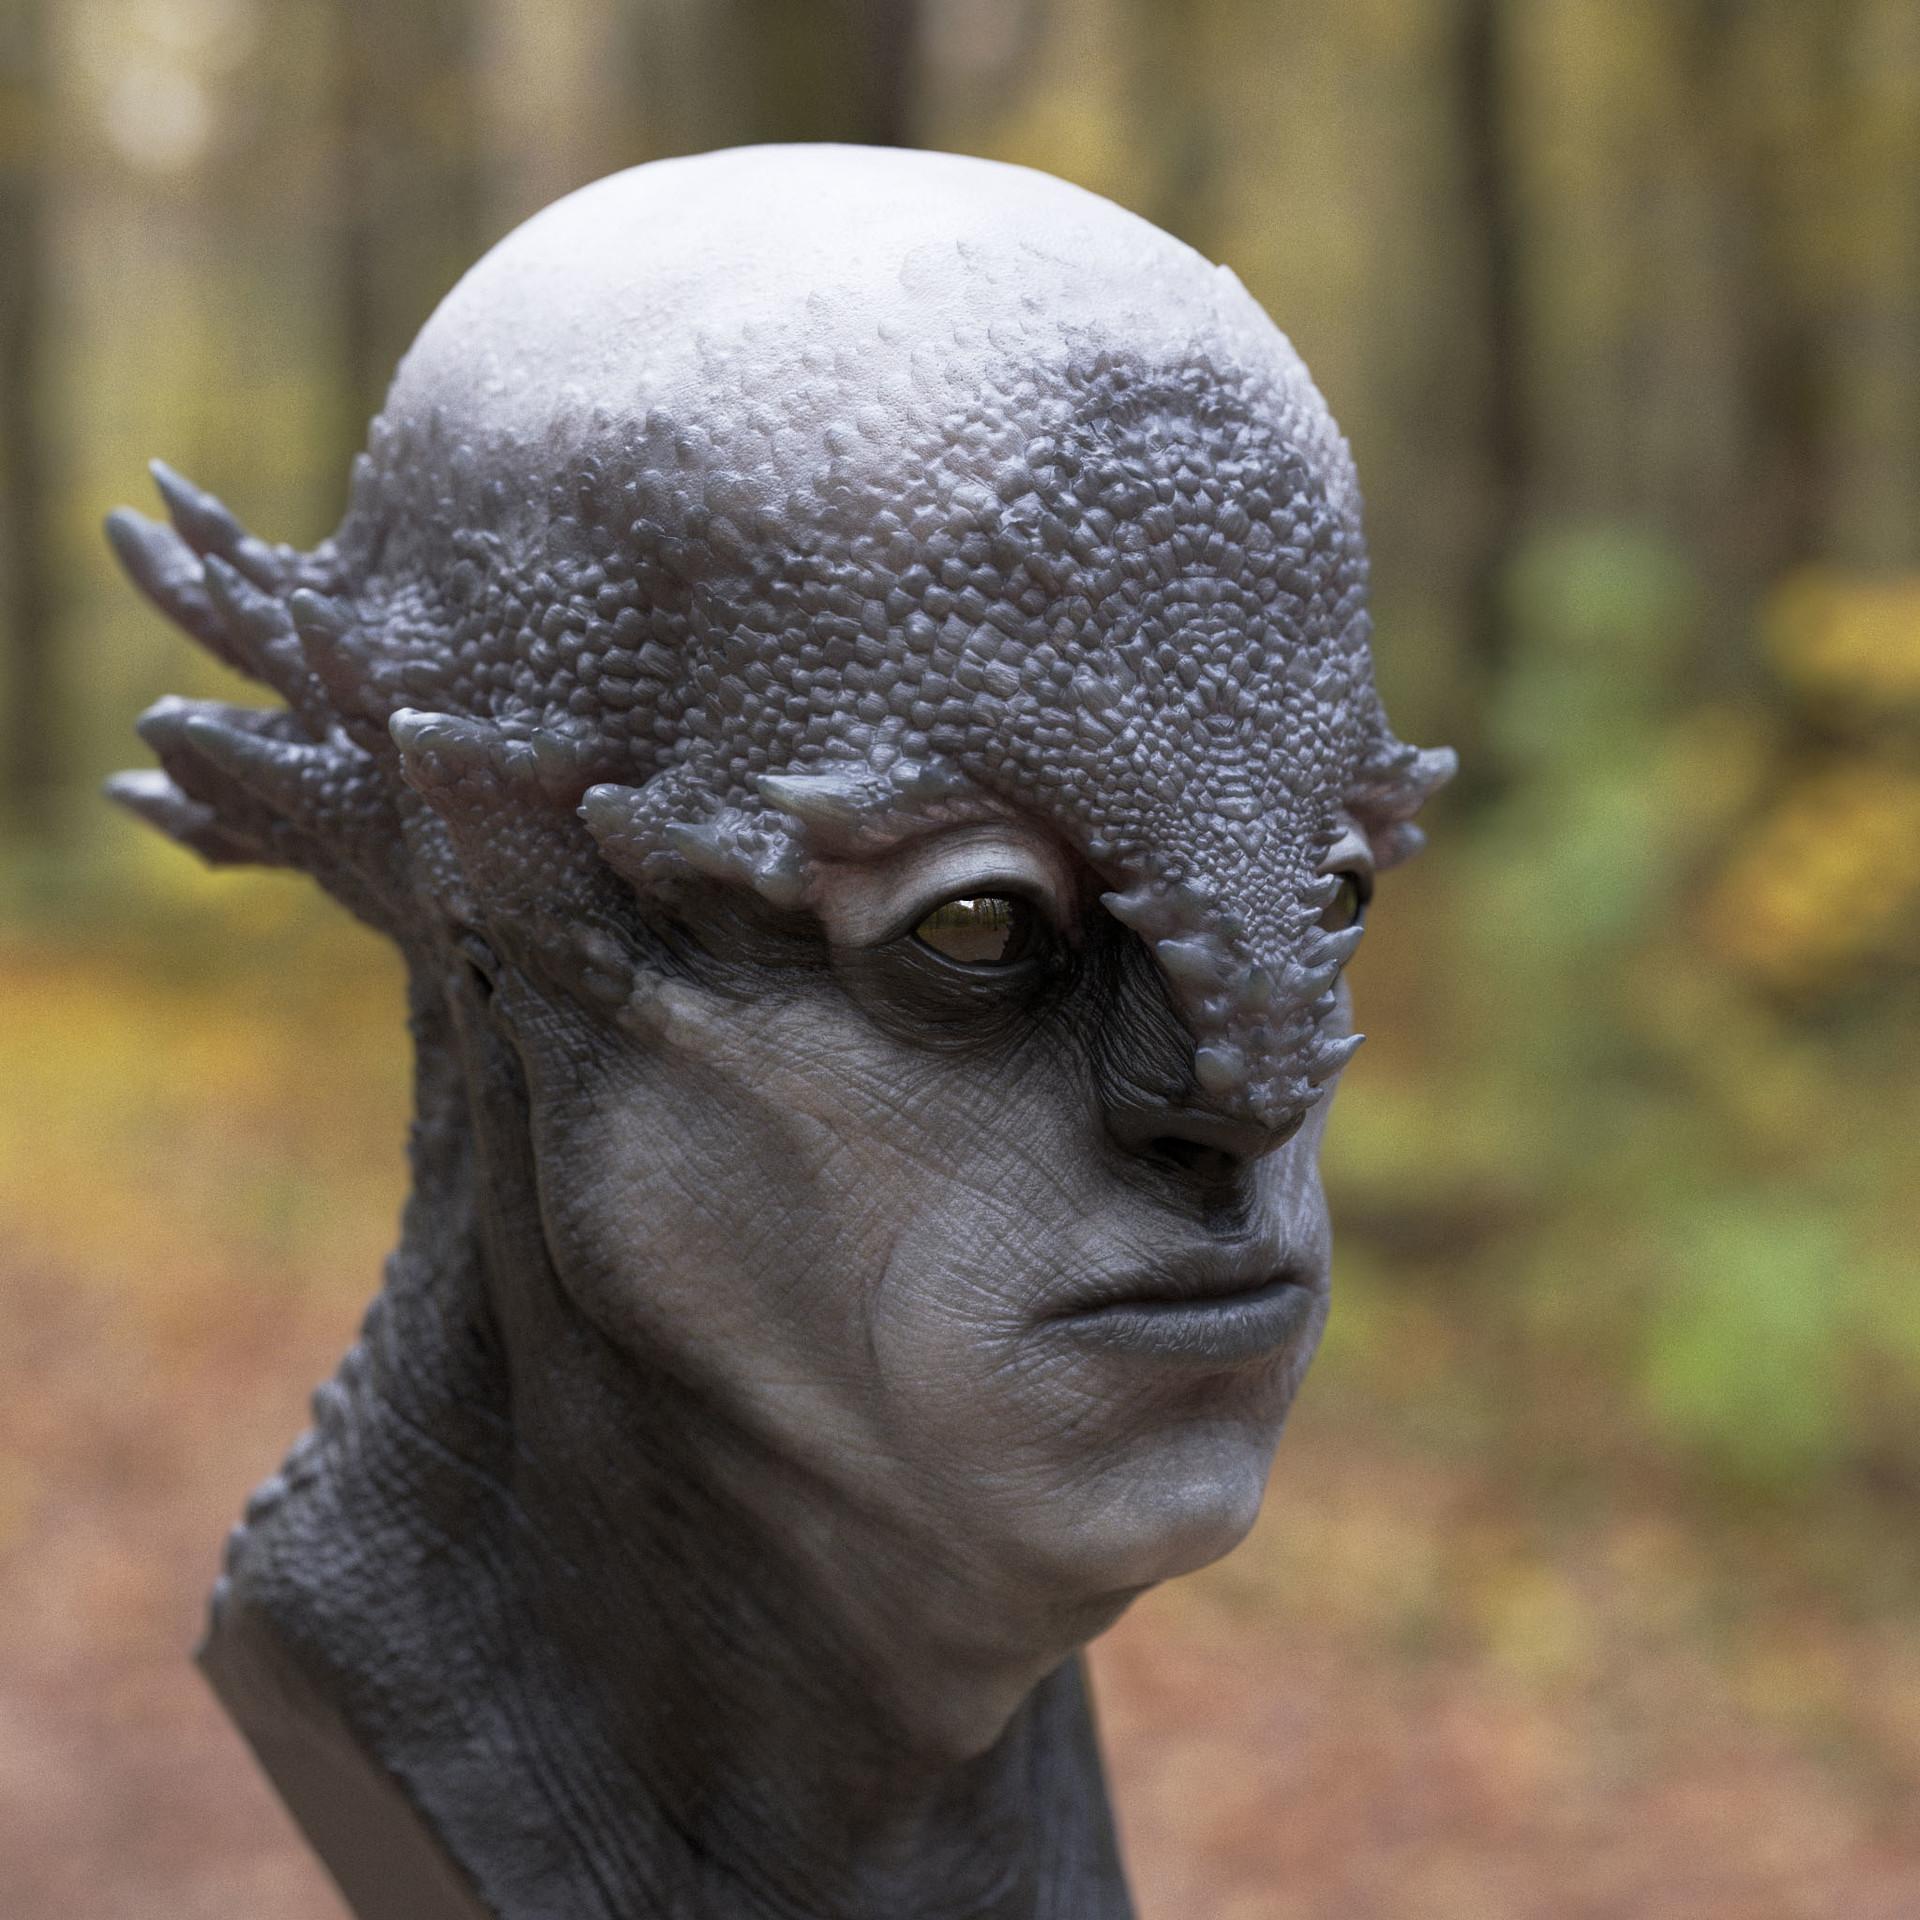 Neal biggs bonehead01 0004